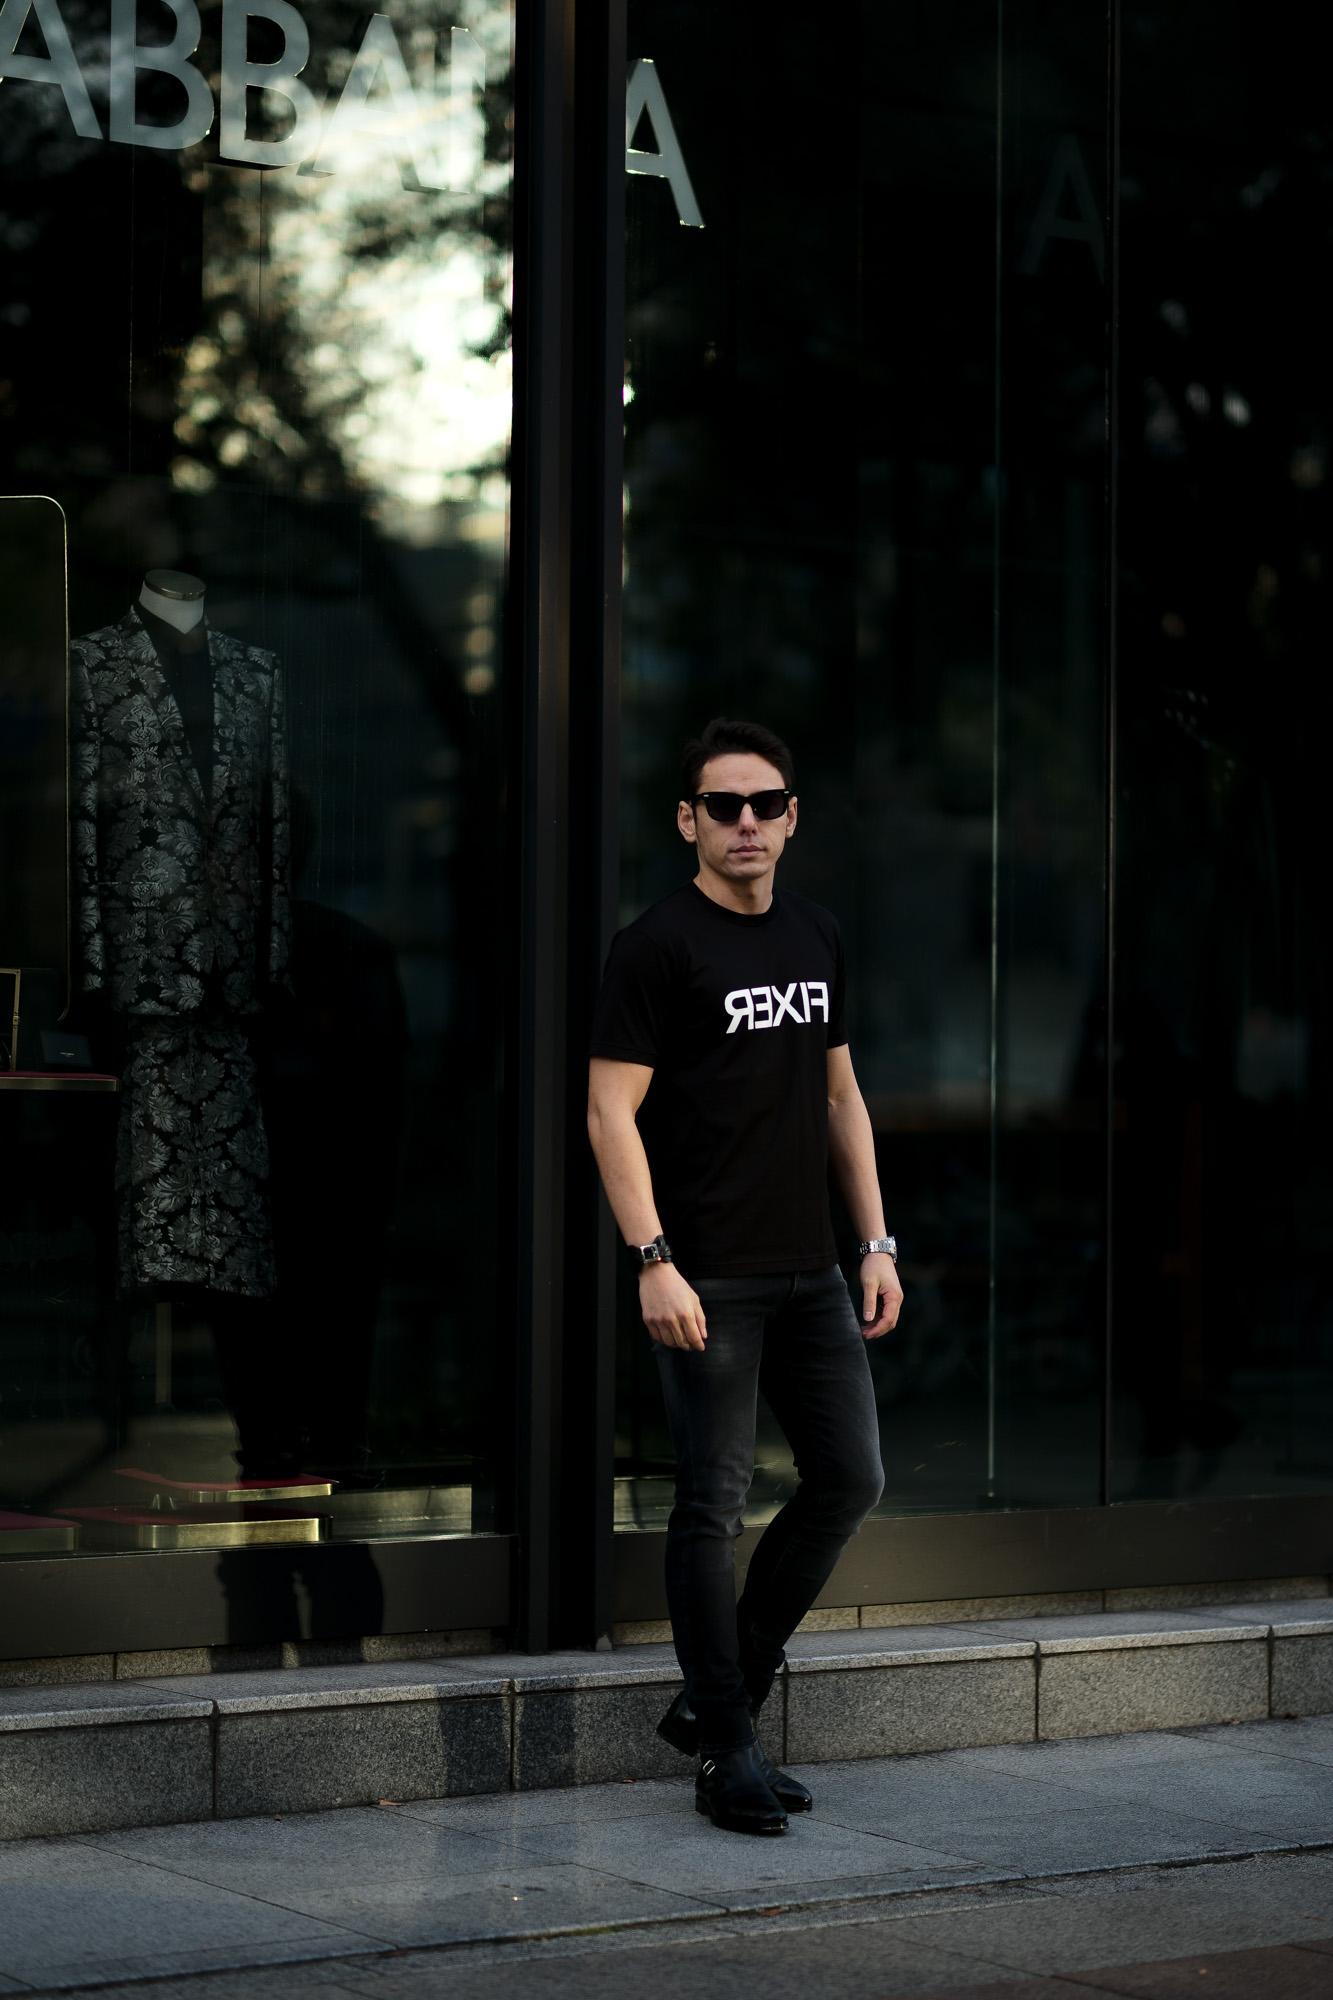 FIXER (フィクサー) FTS-03 Reverse Print Crew Neck T-shirt リバースプリント Tシャツ BLACK (ブラック) 愛知 名古屋 Alto e Diritto altoediritto アルトエデリット Tシャツ